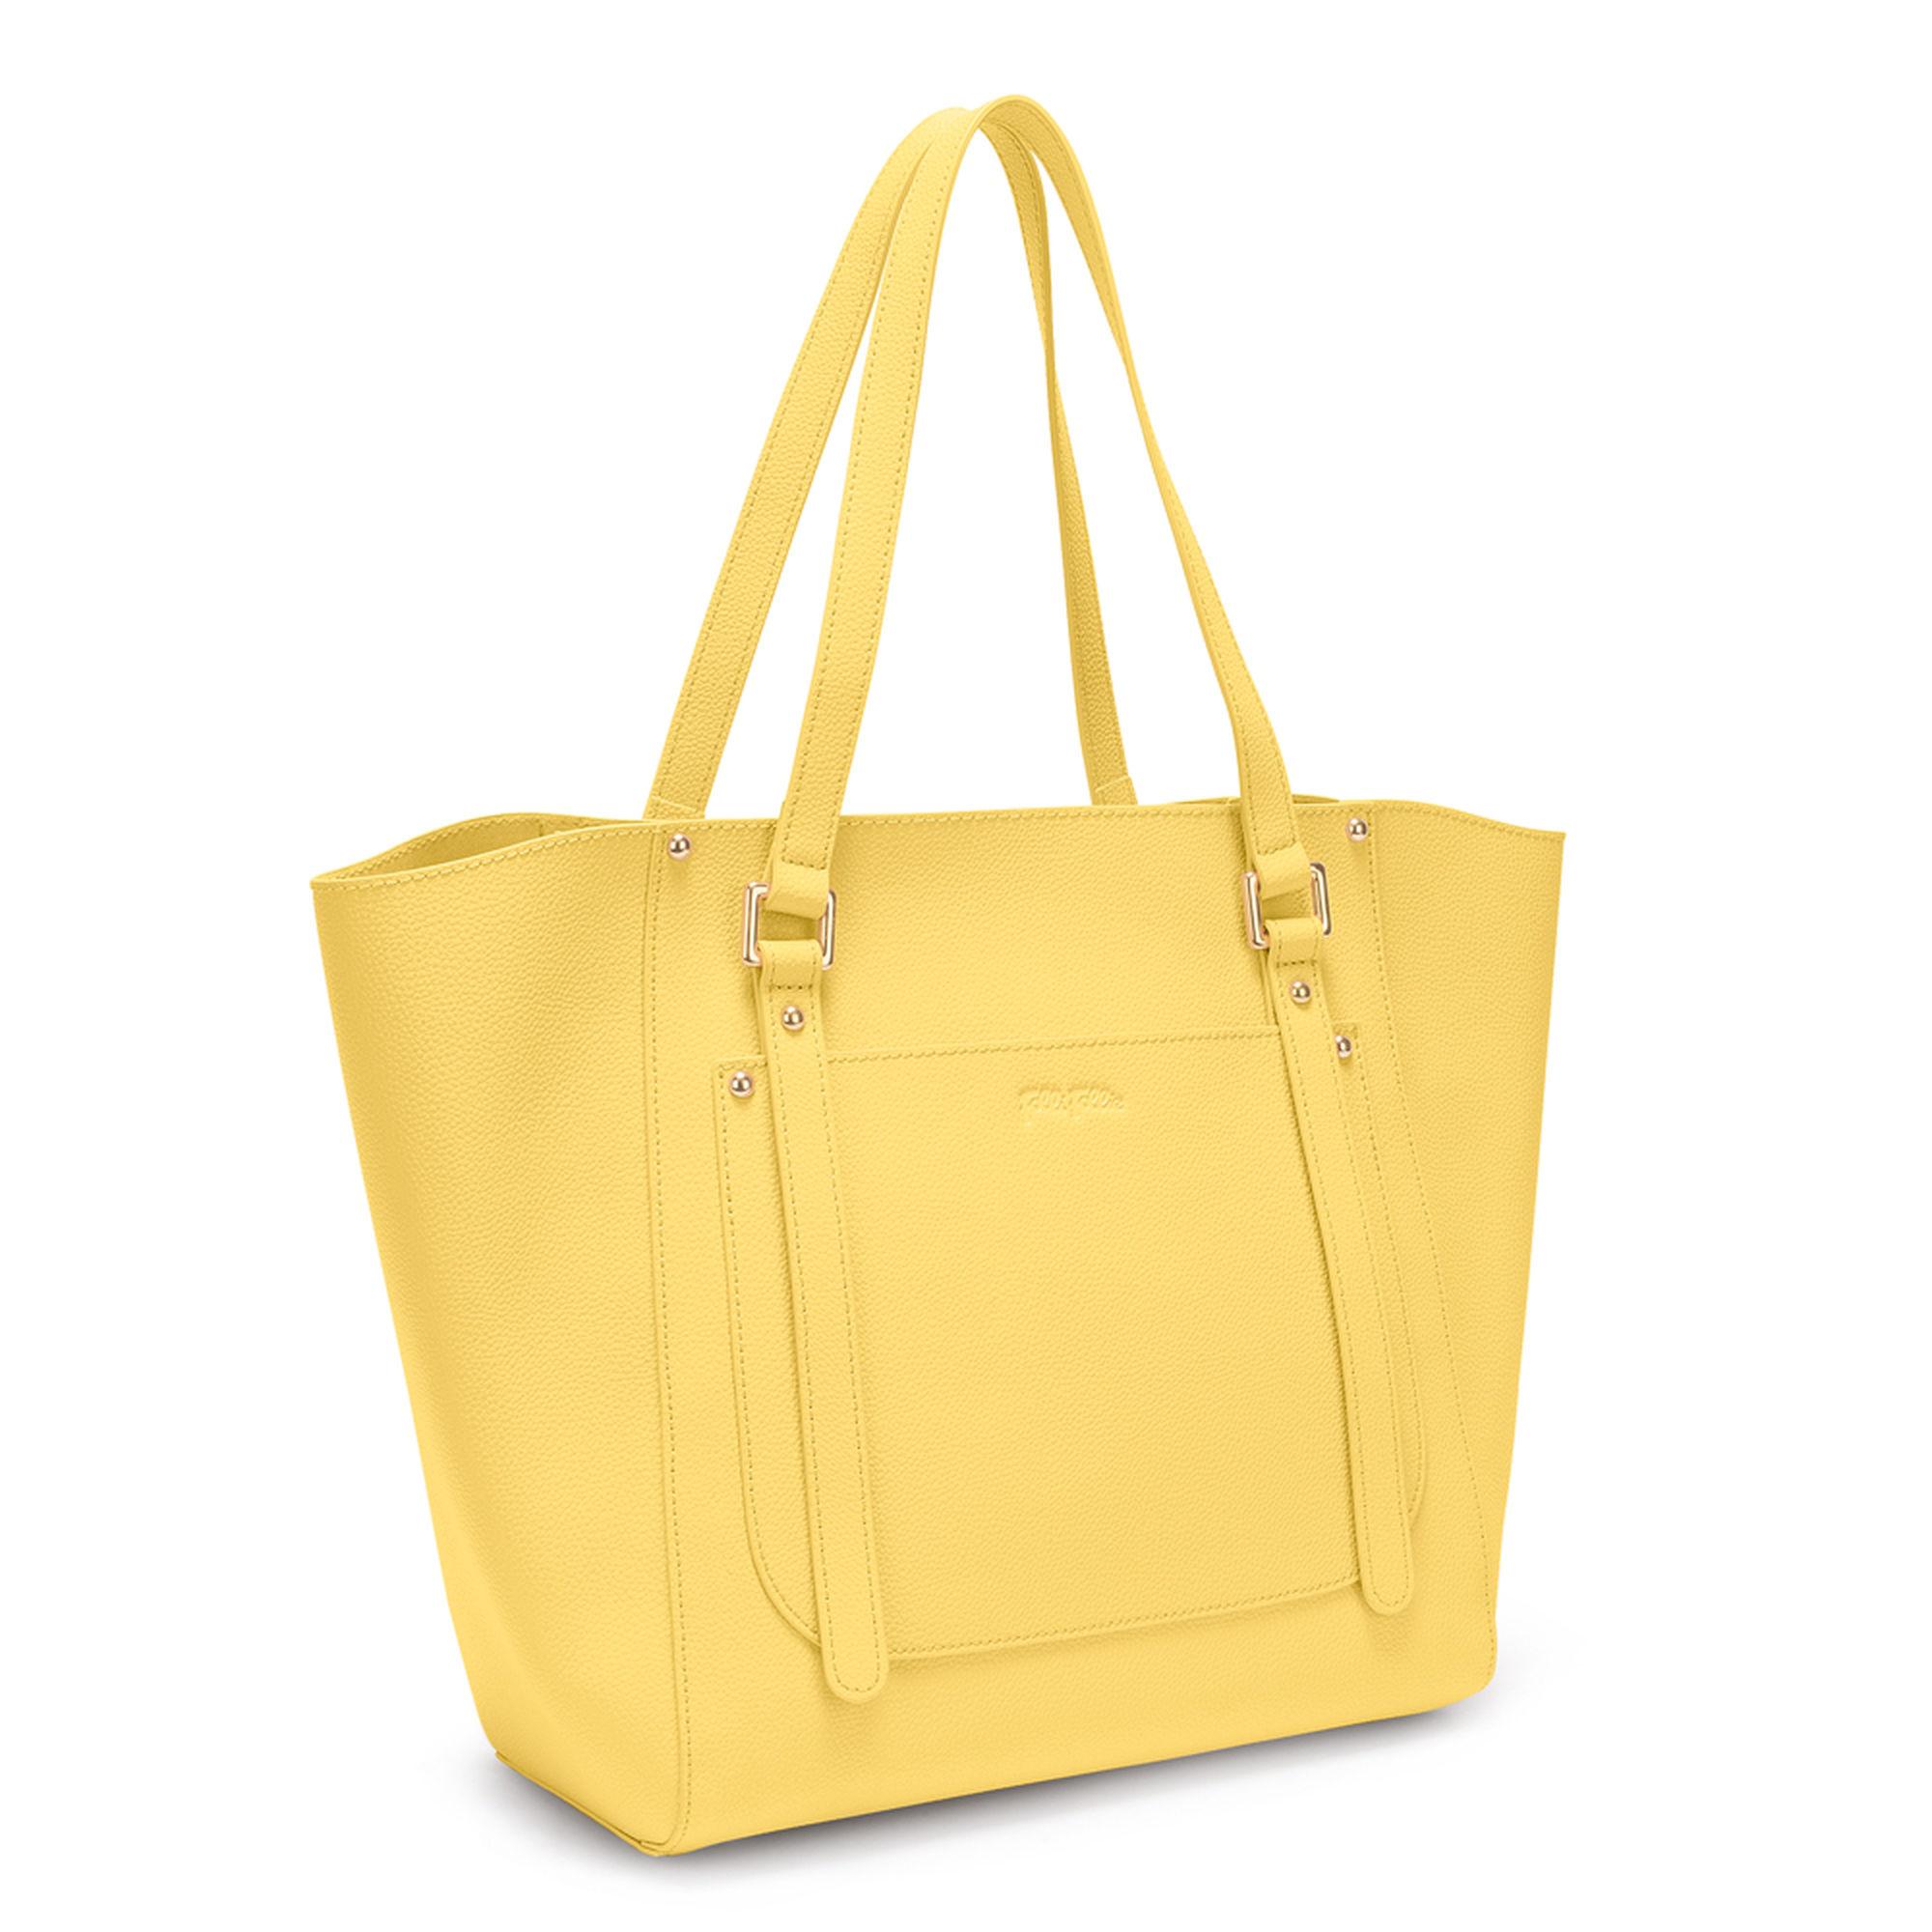 Newsorama  Οδηγός Αγοράς  10 top handle ανοιξιάτικες τσάντες για all ... a0598a3d9b8